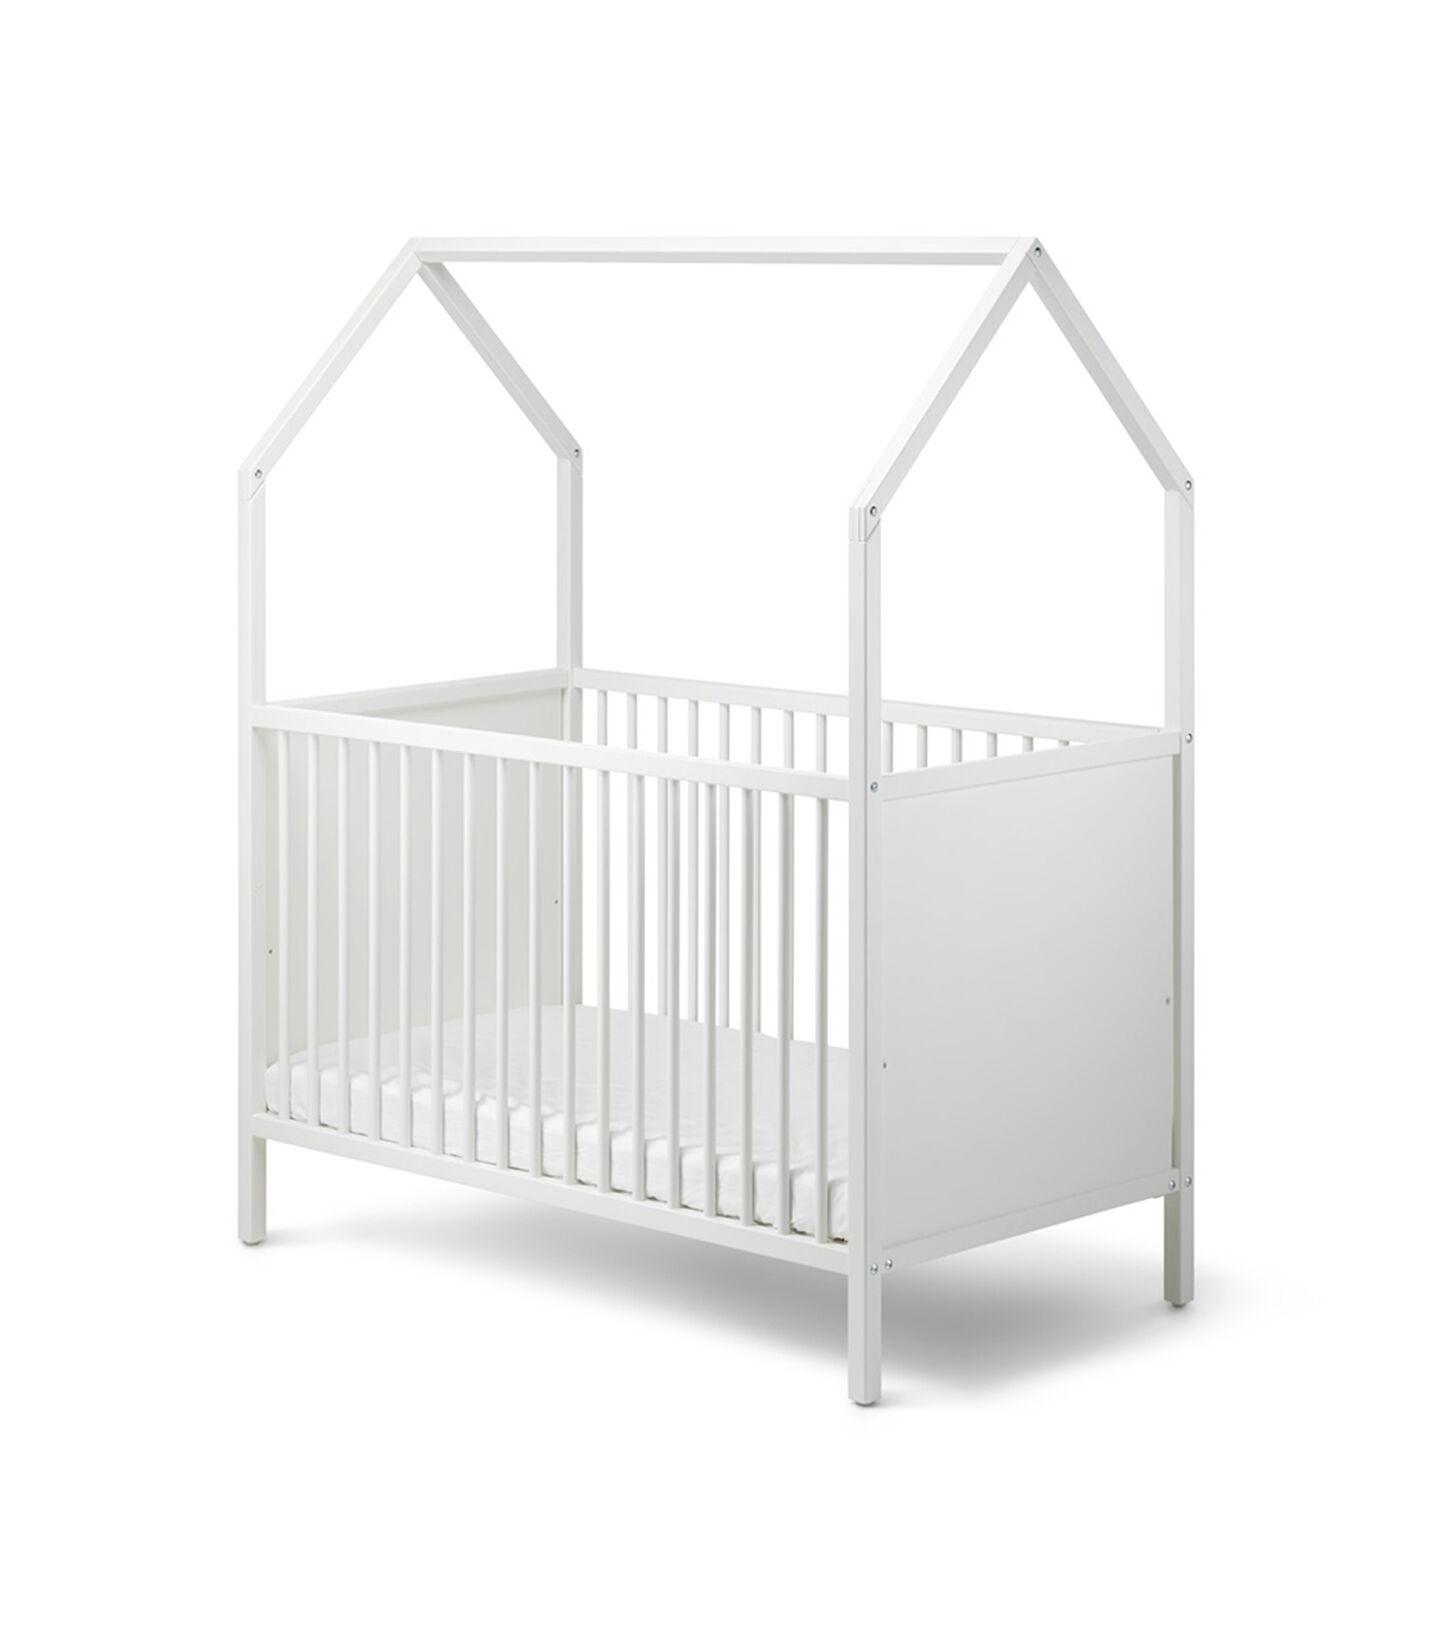 Stokke® Home™ Bed White.